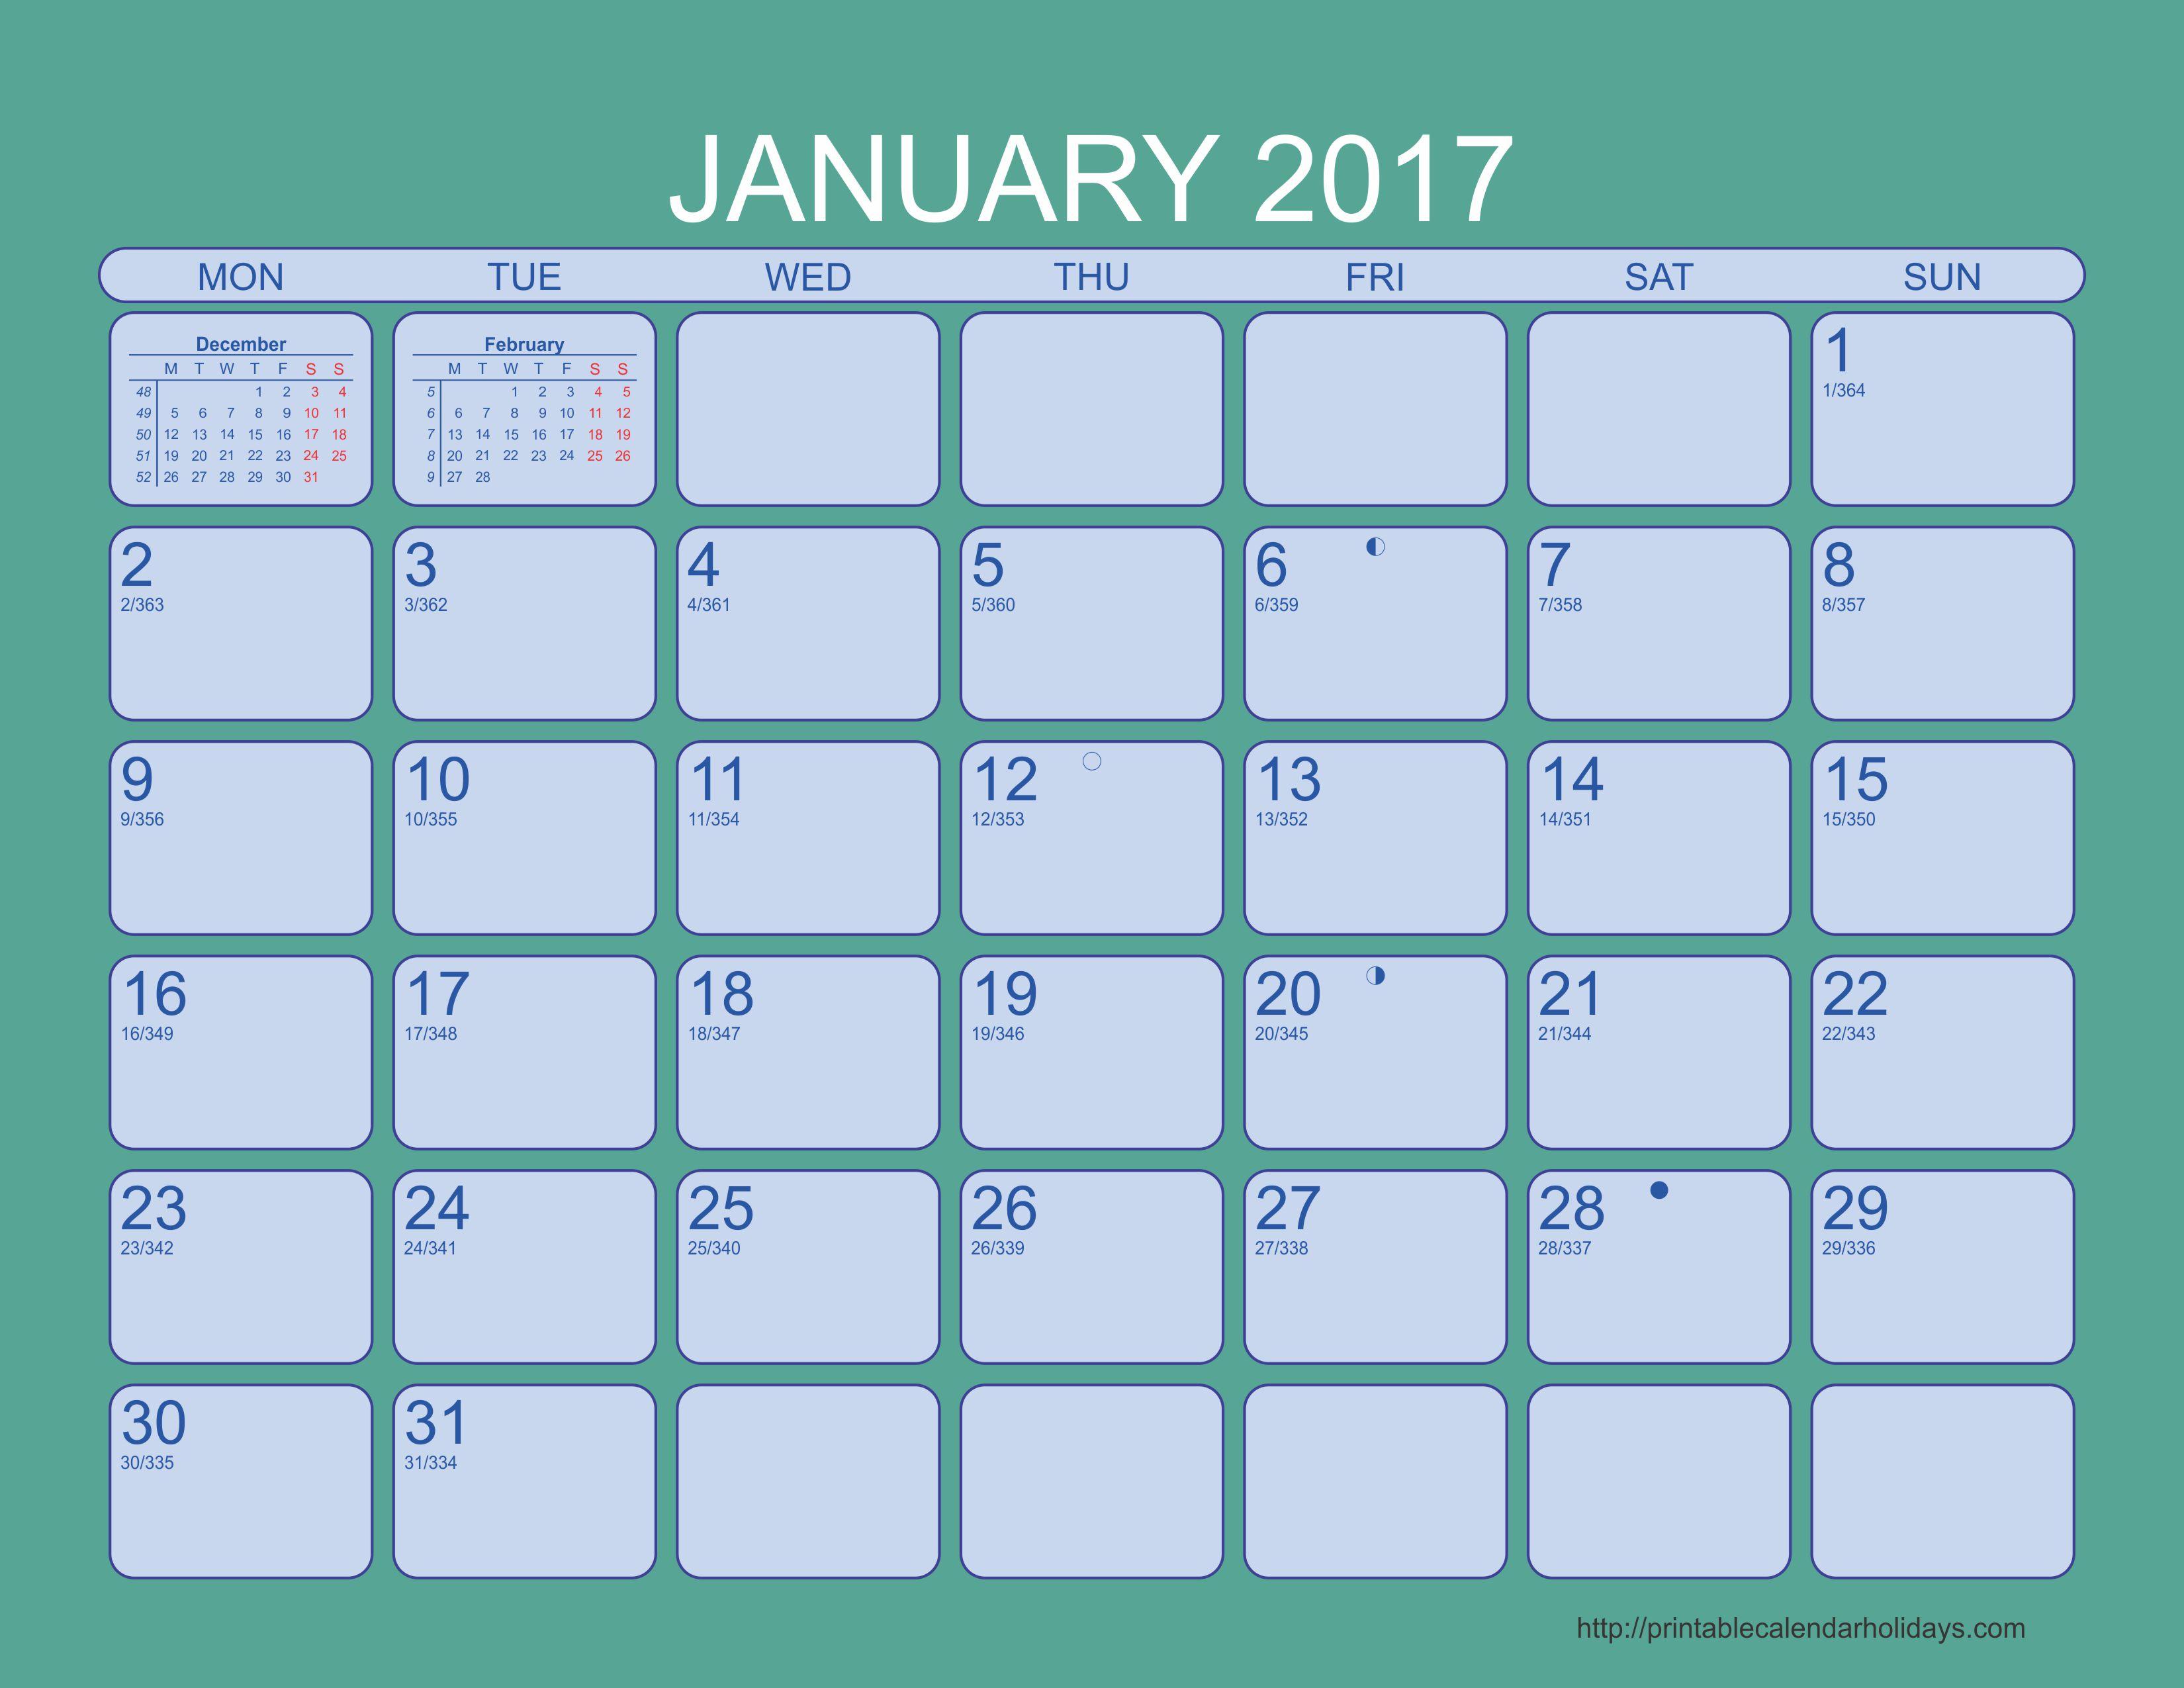 January 2017 Calendar - 6 Templates Landscape - Printable 2017 2018